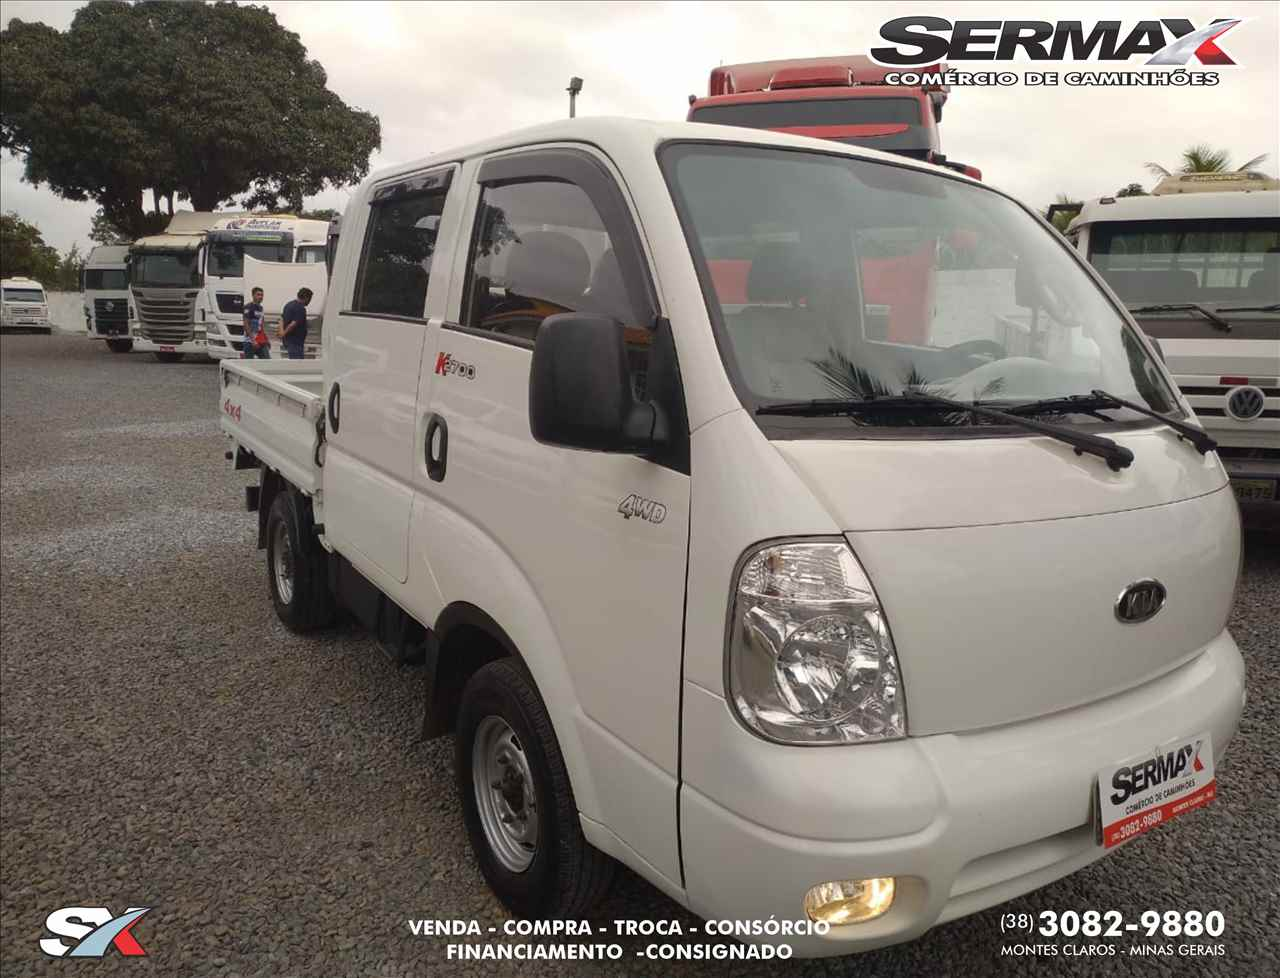 UTILITARIOS KIA MOTORS Bongo K-2700 CD Sermax Caminhões MONTES CLAROS MINAS GERAIS MG